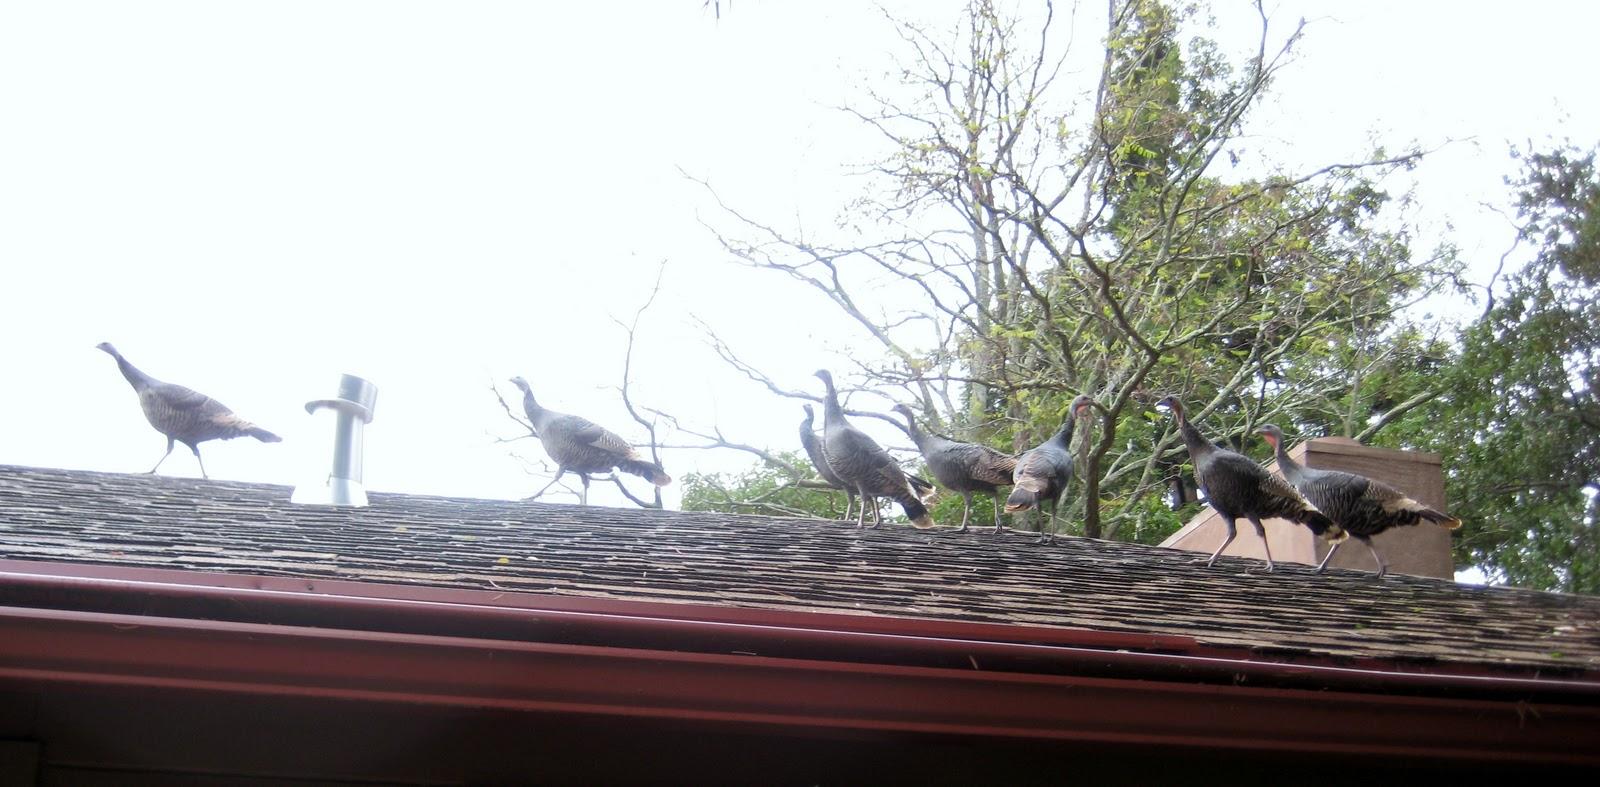 Early birds deals